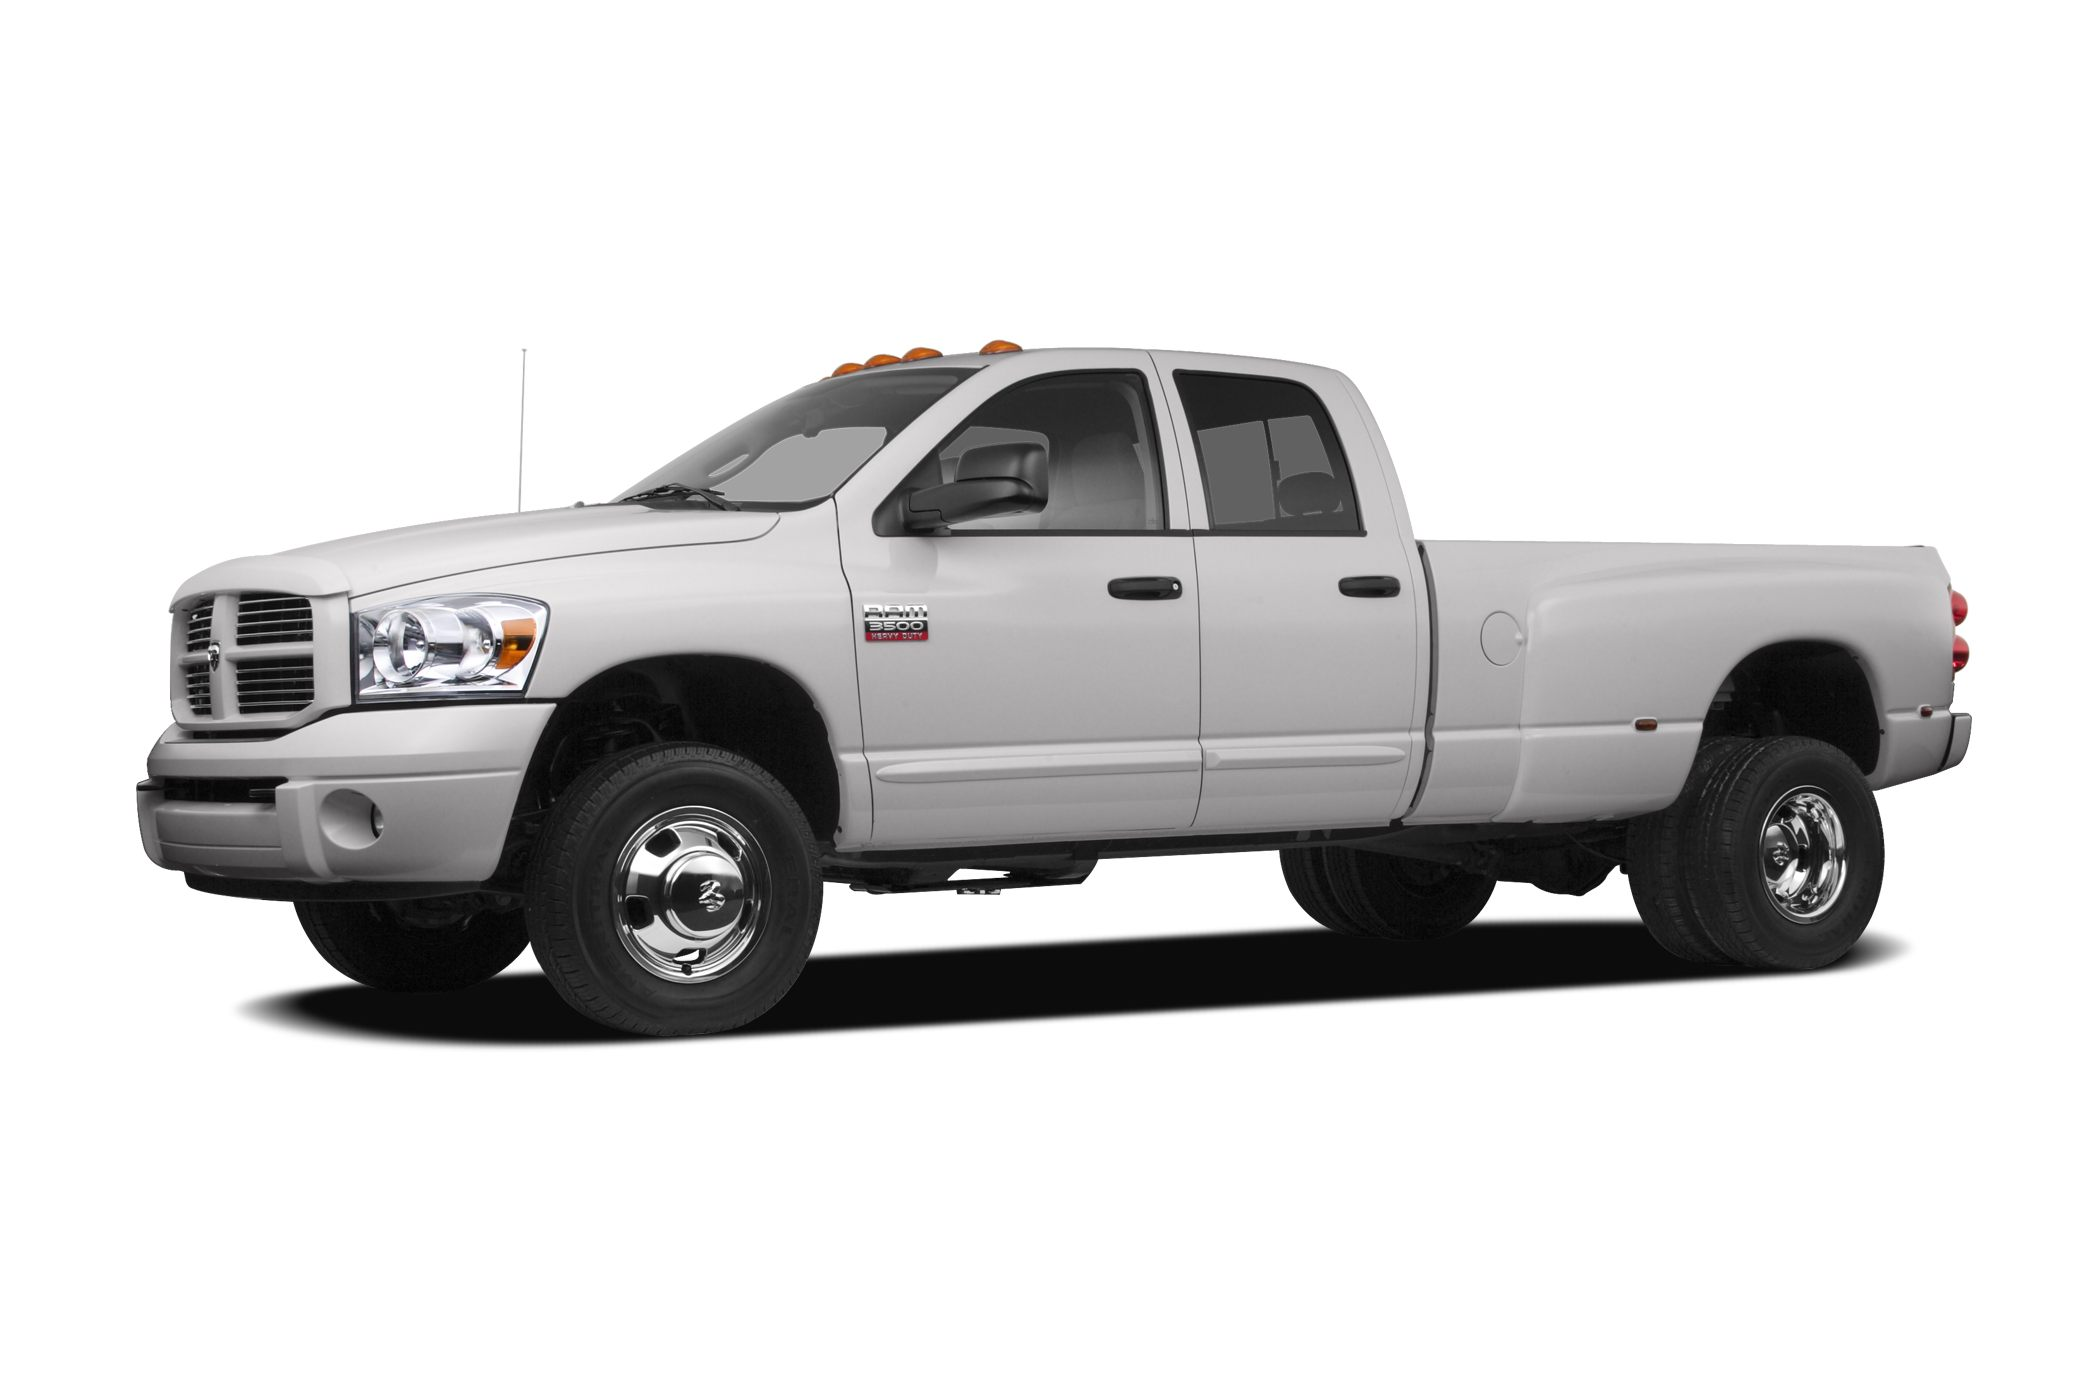 2007 Dodge Ram 3500  Miles 63318Stock 7G826684 VIN 3D7ML48A87G826684